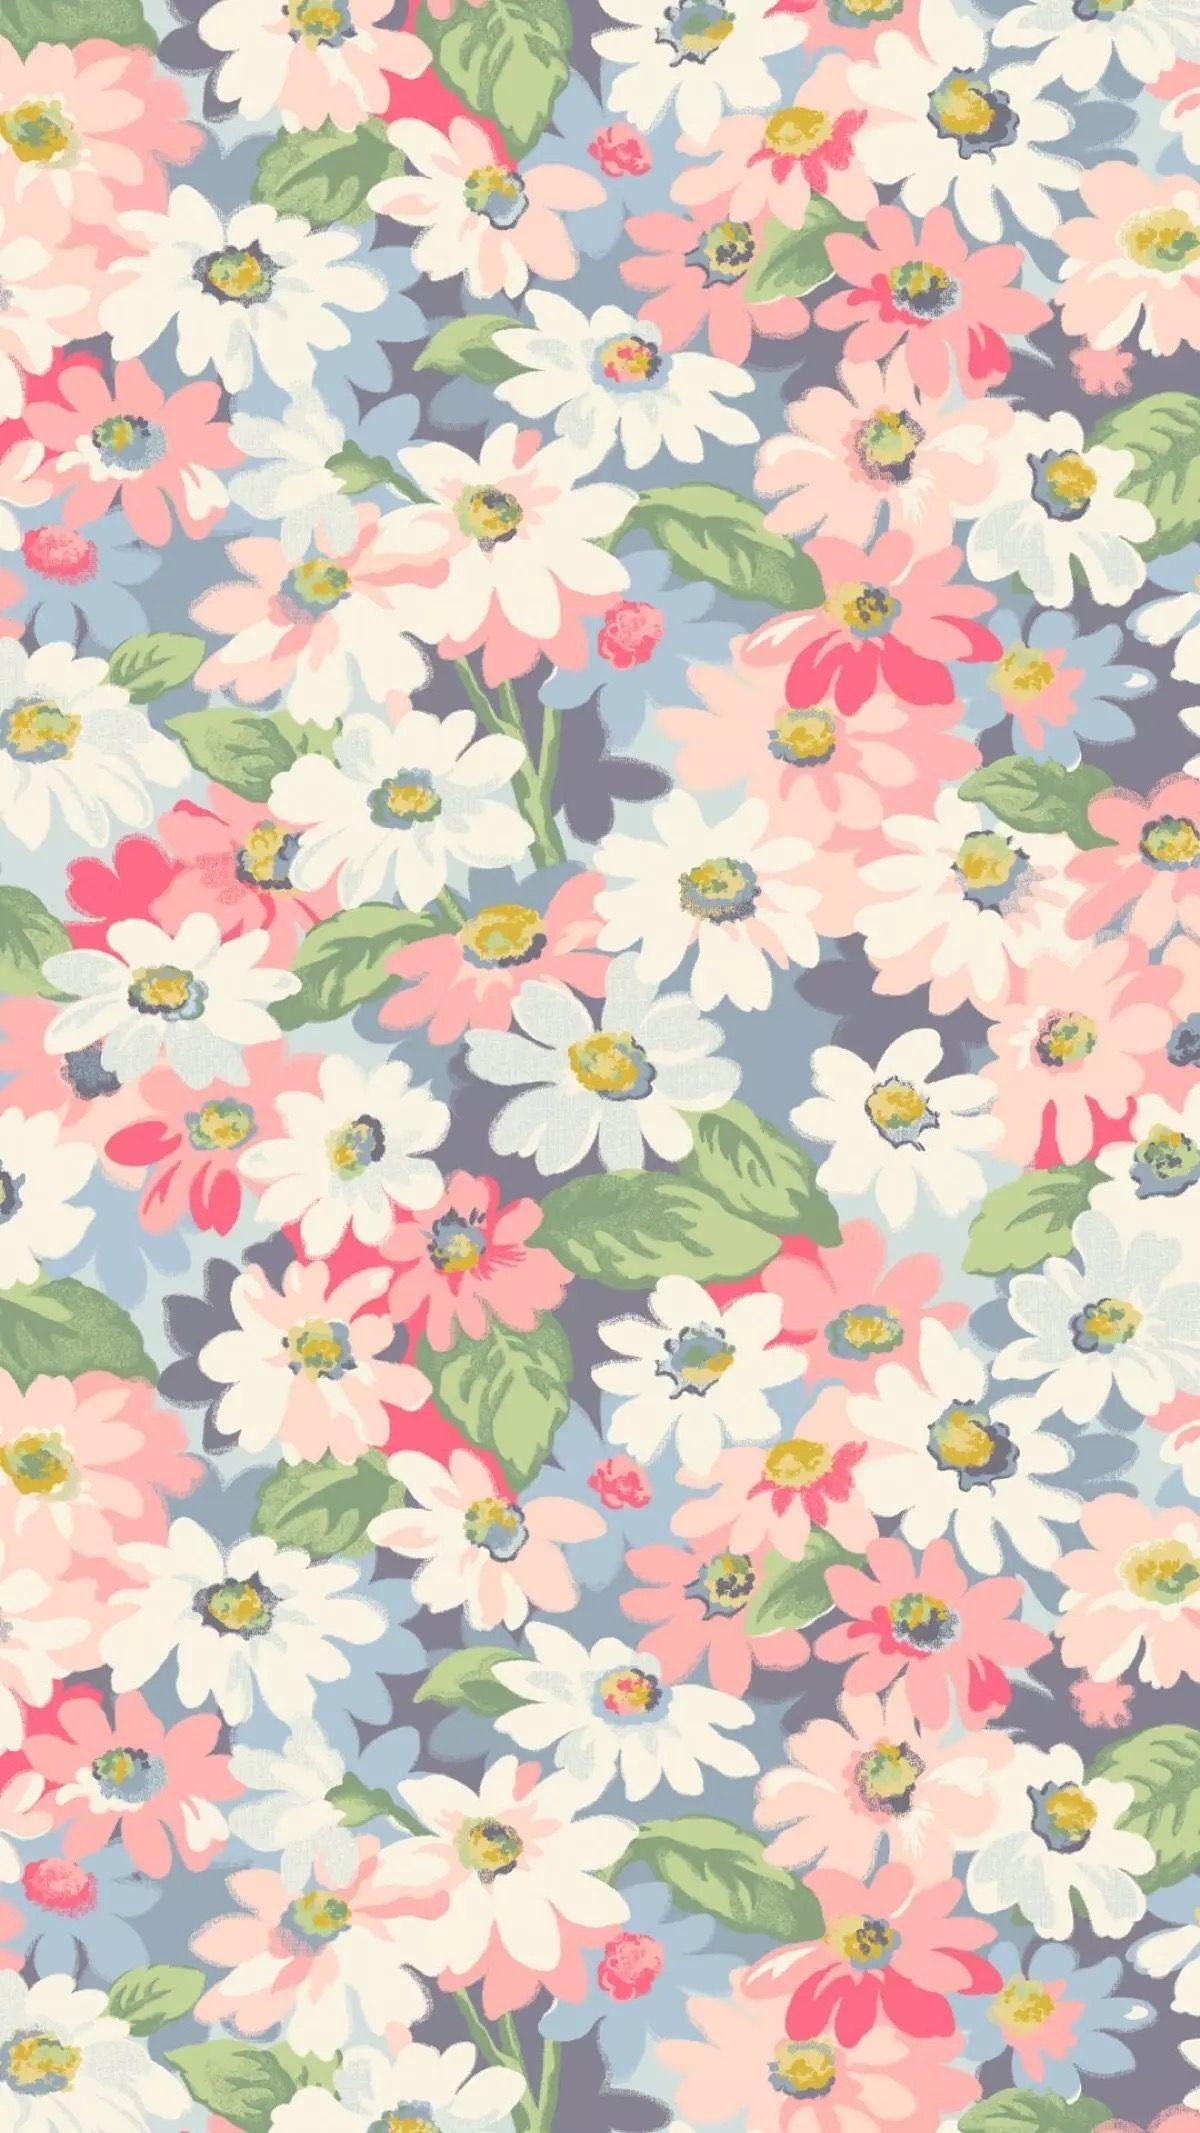 Popular Wallpaper Hello Kitty Floral - d6005afbdaf805521a64abefa33b9e47  Graphic_363712.jpg